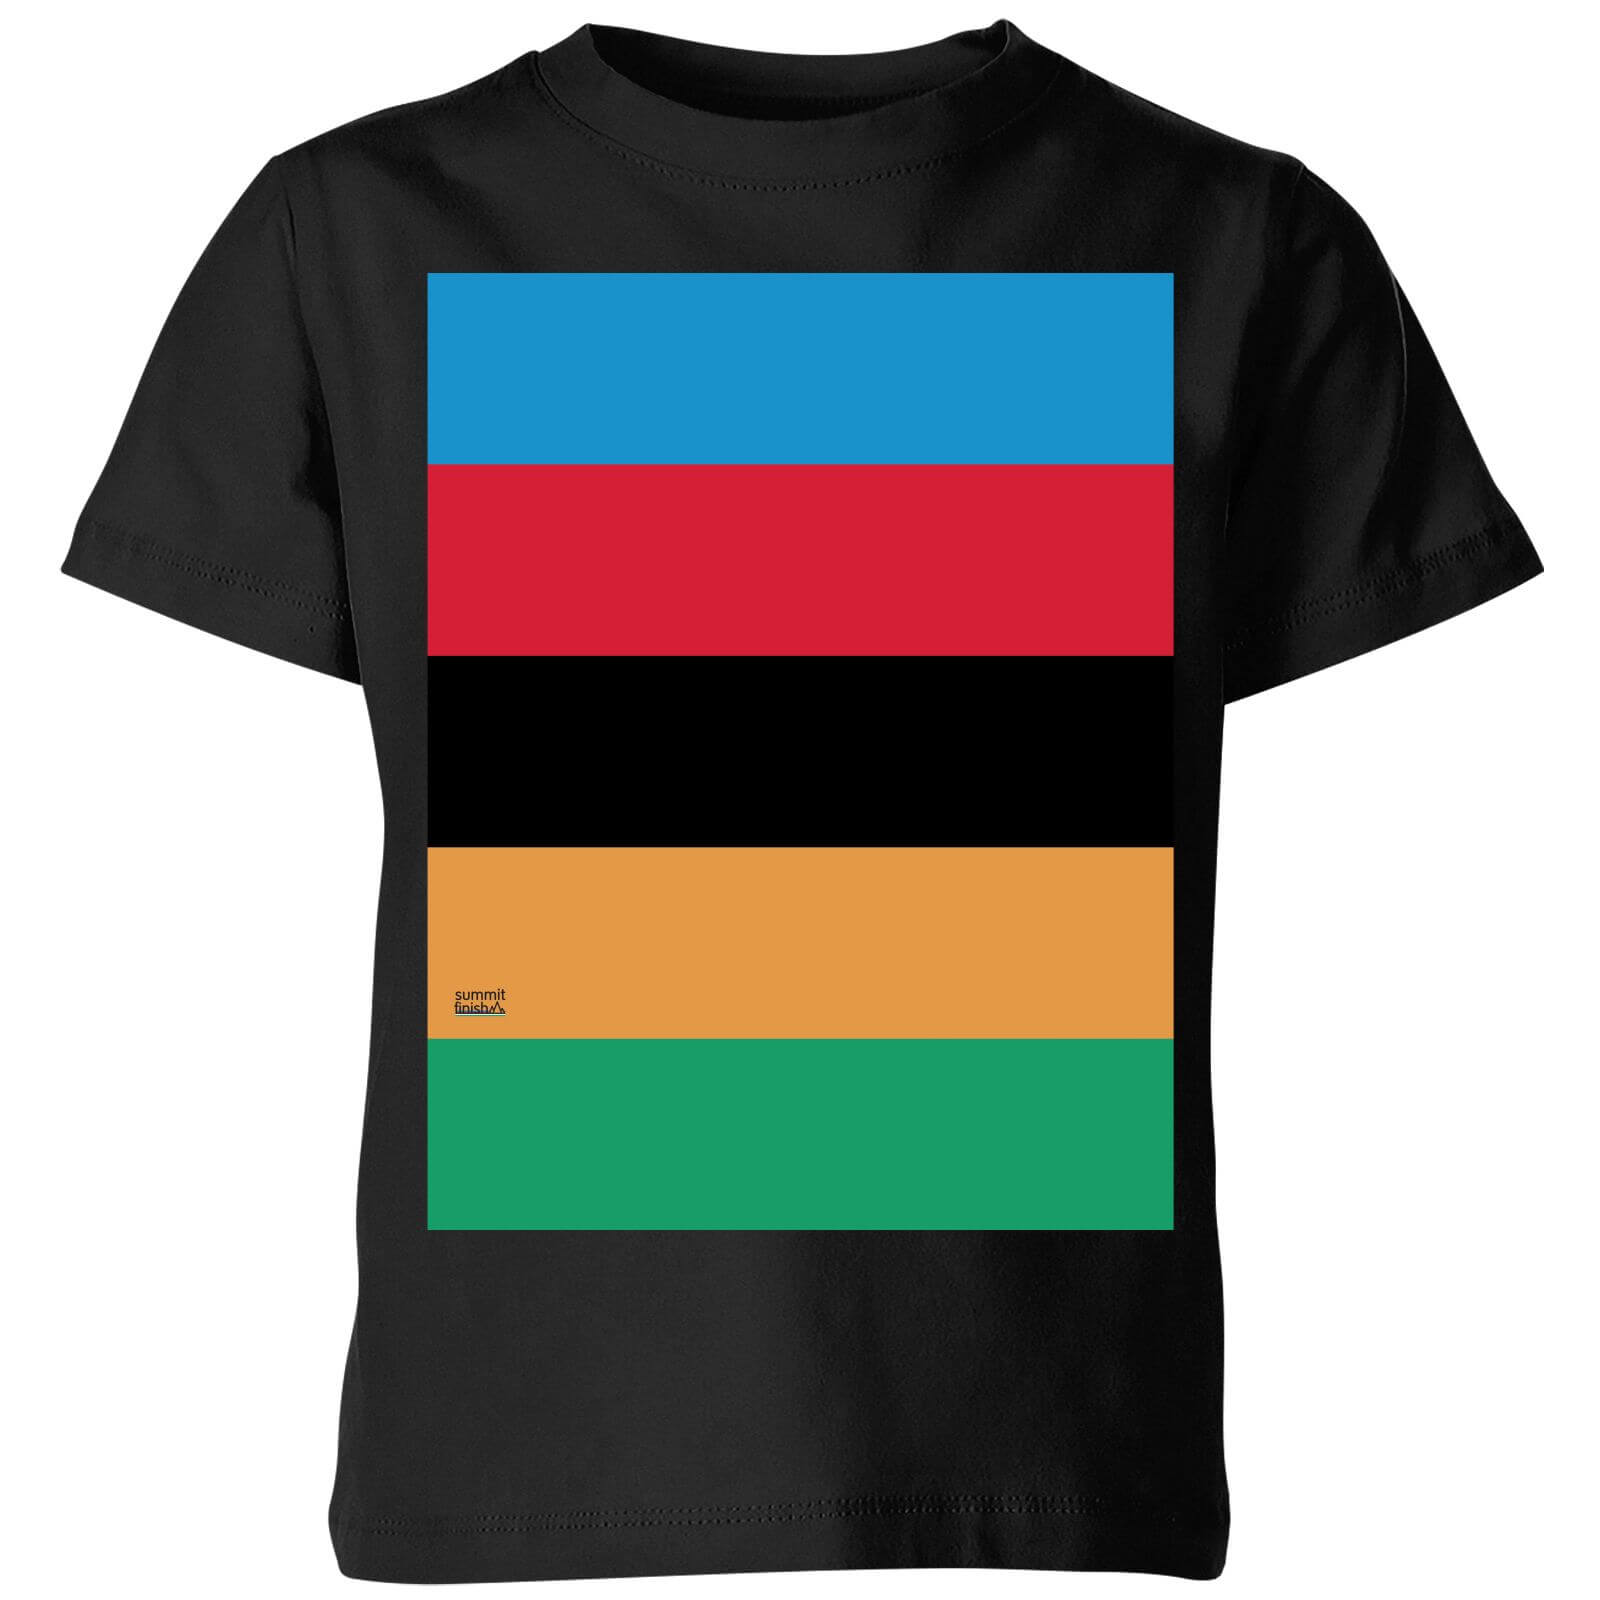 Summit Finish World Champion Stripes Kids' T-Shirt - Black - 5-6 Years - Black